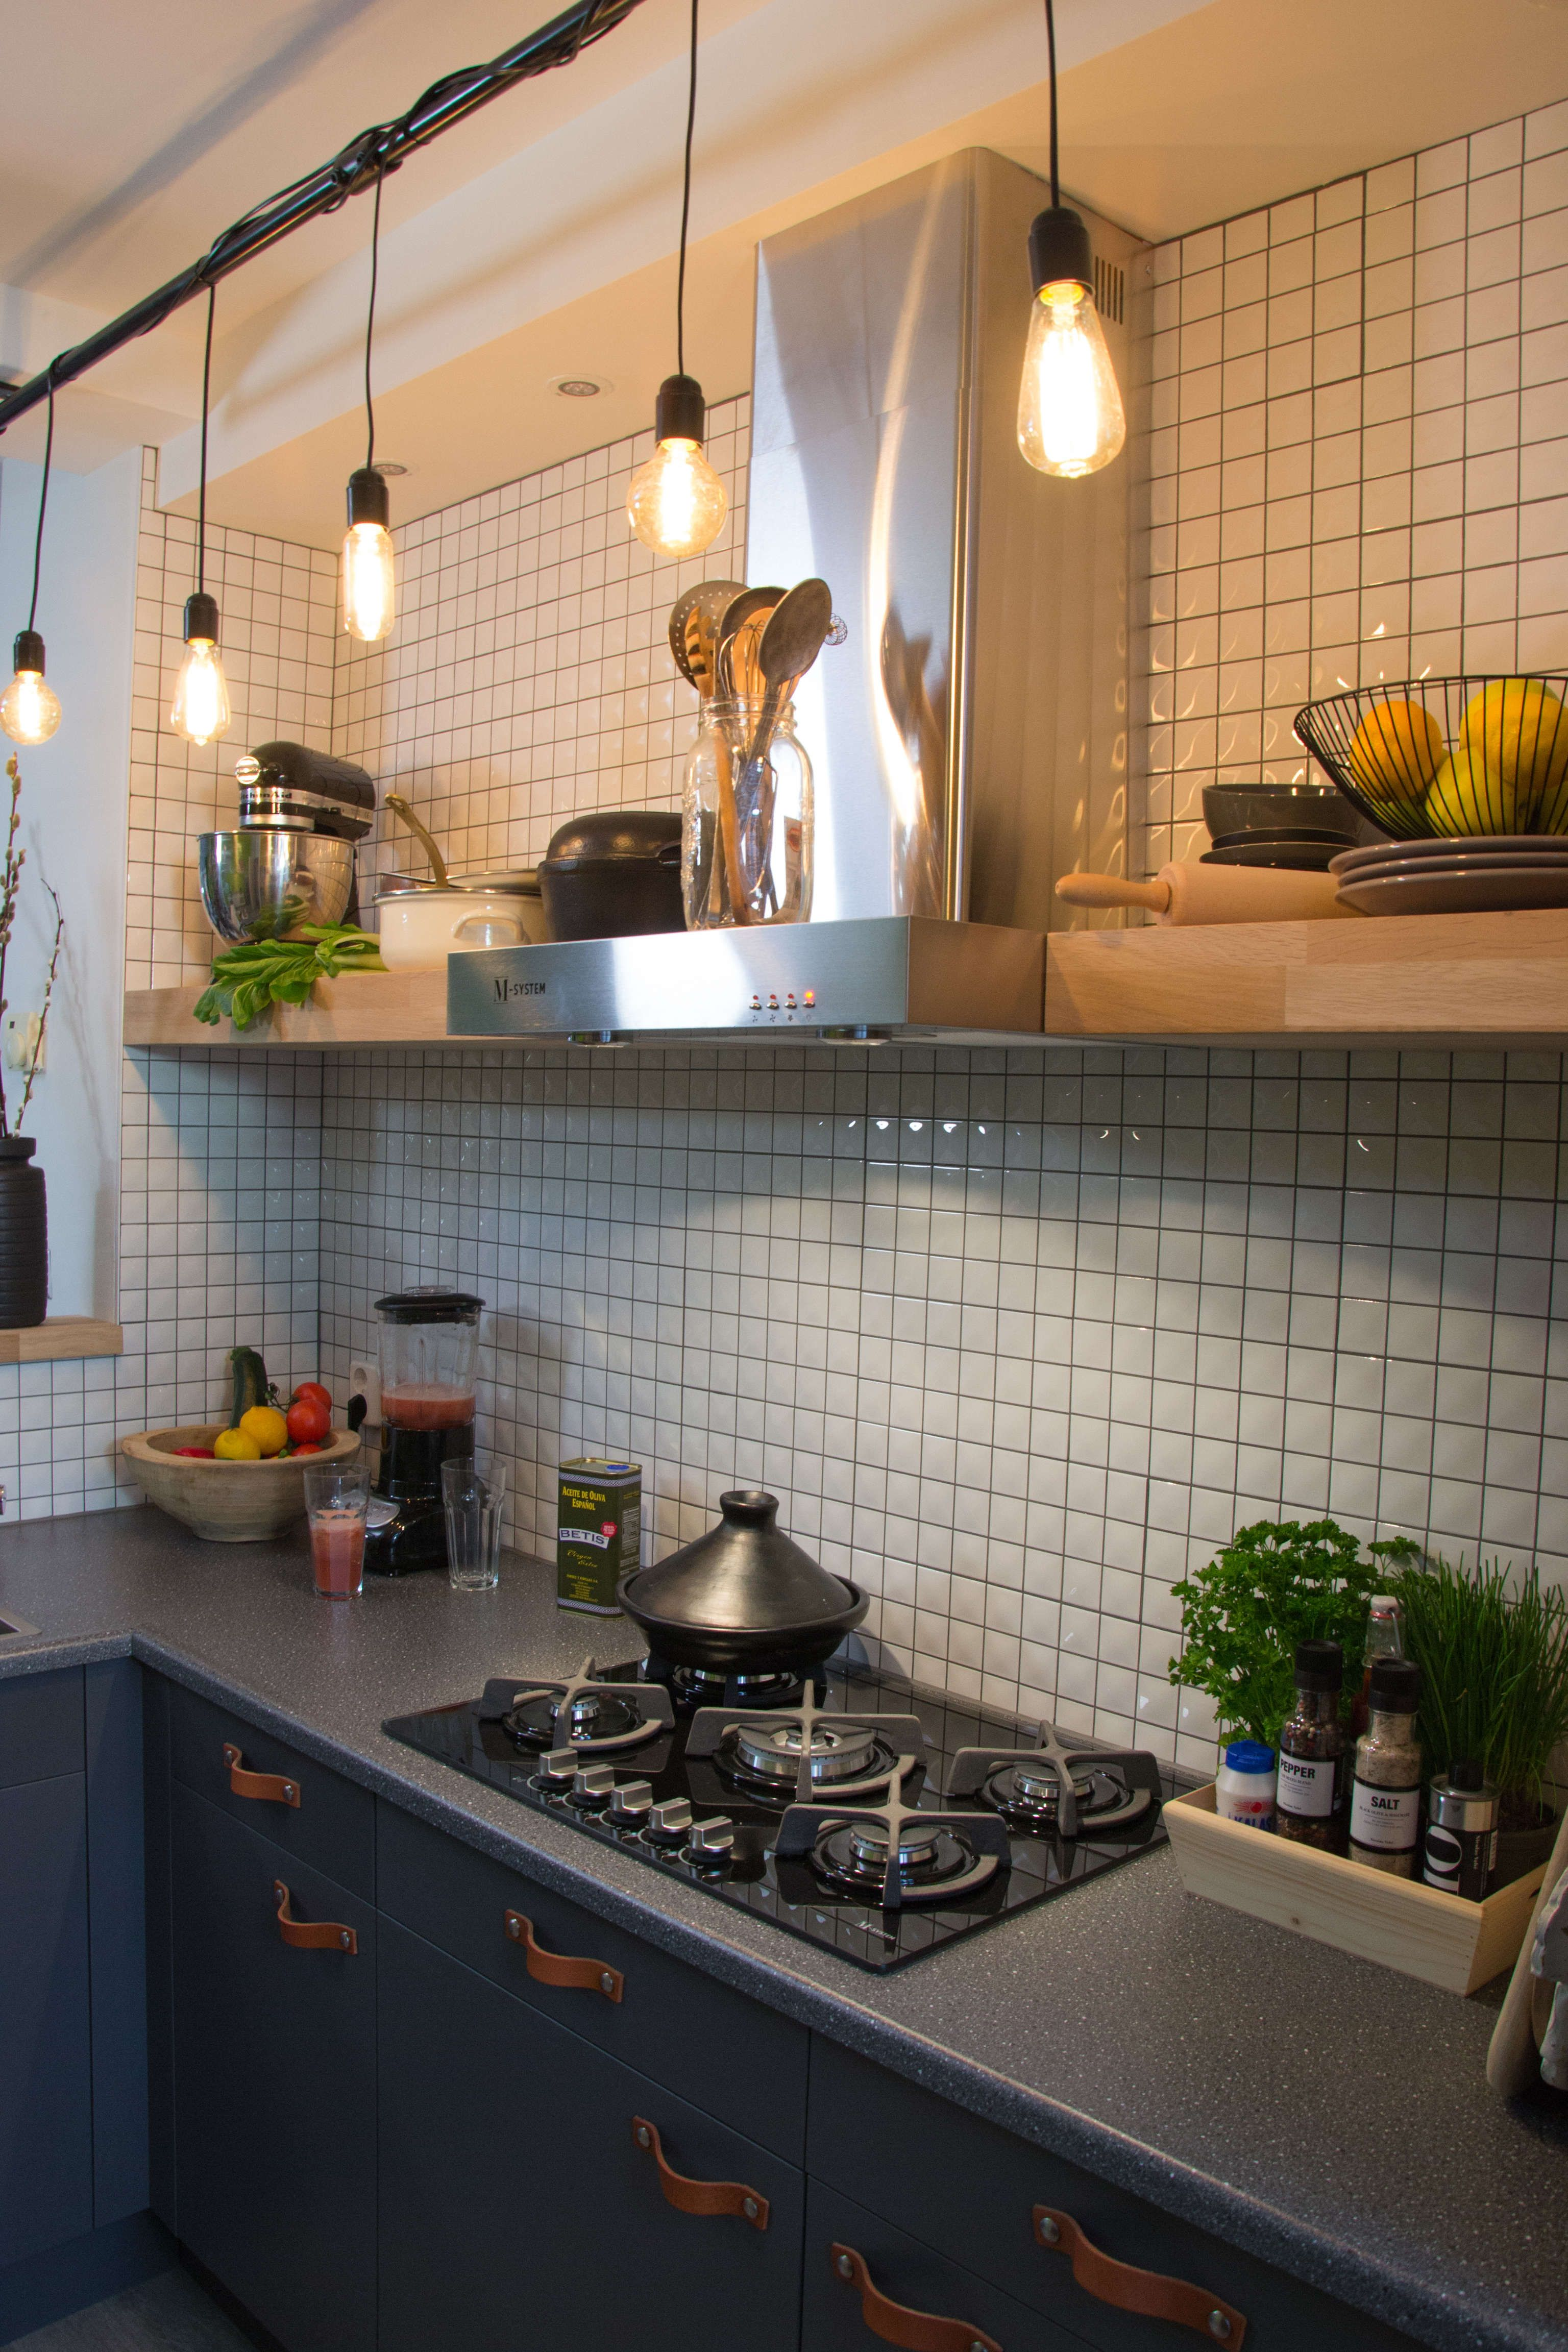 Lampen Keuken : Lampen boven de keuken via eigen huis tuin